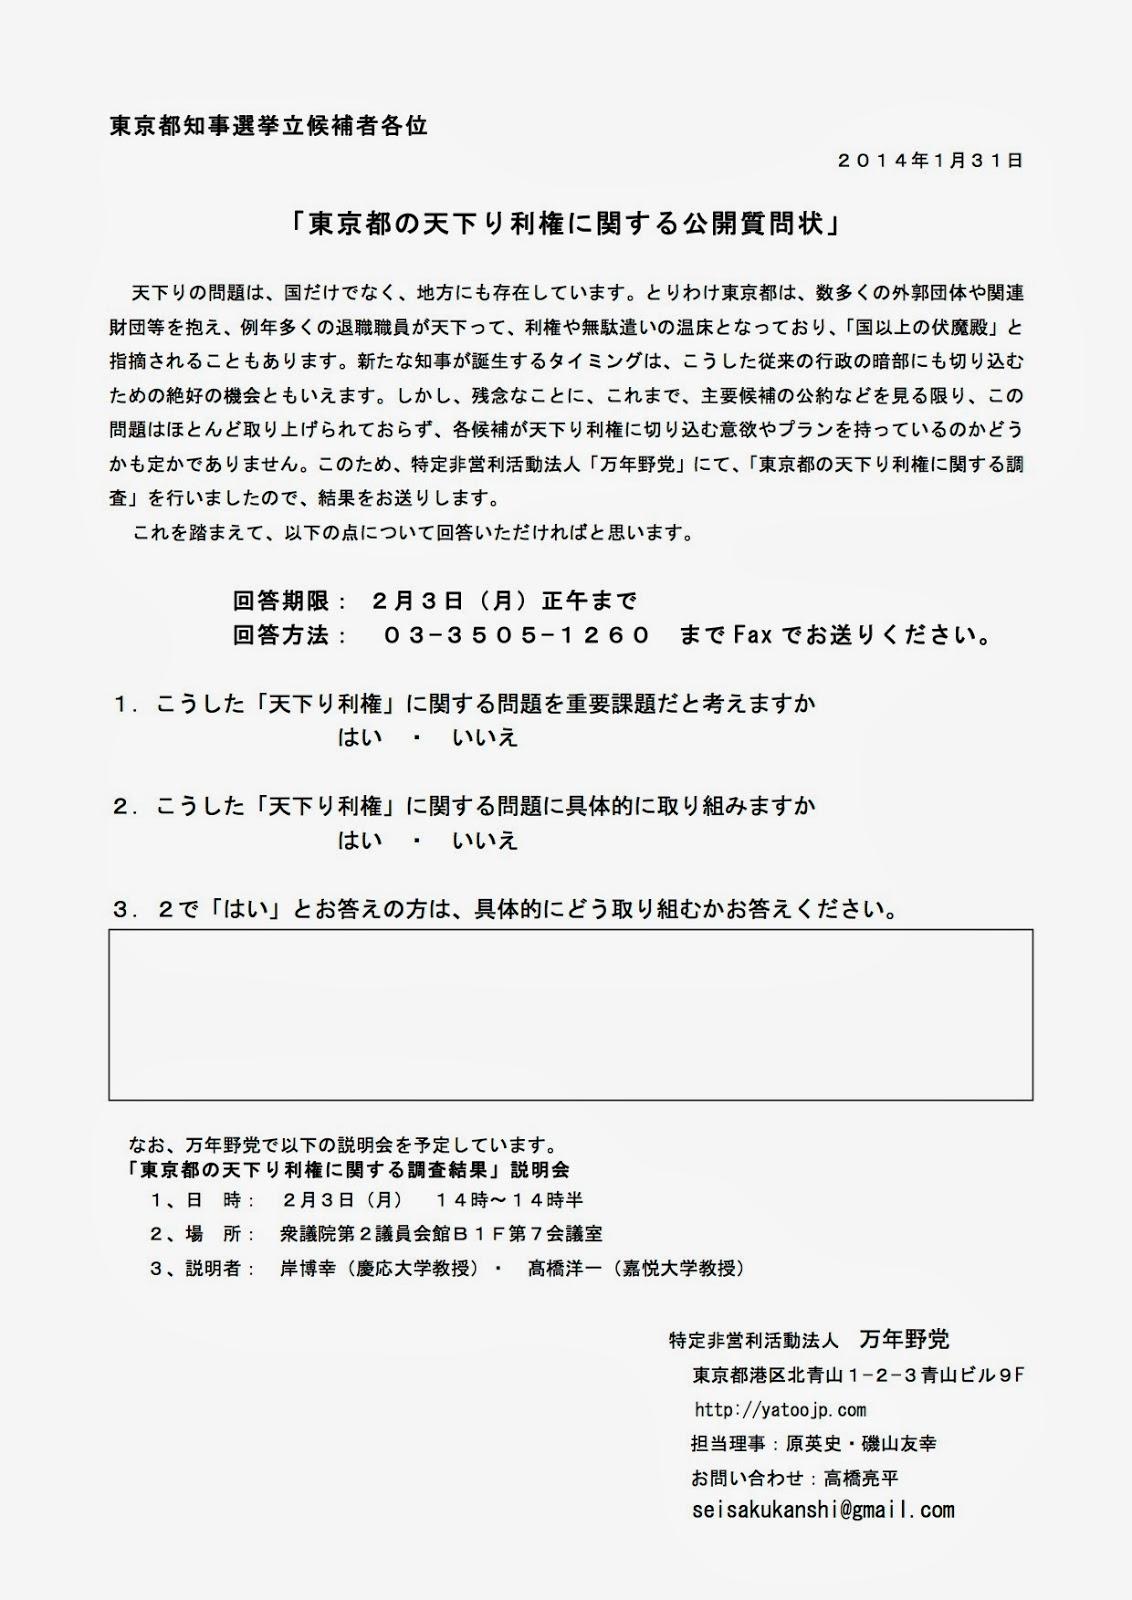 NPO法人「万年野党」が、東京都知事選立候補者へ送った「東京都の天下り利権に関する公開質問状」を入手